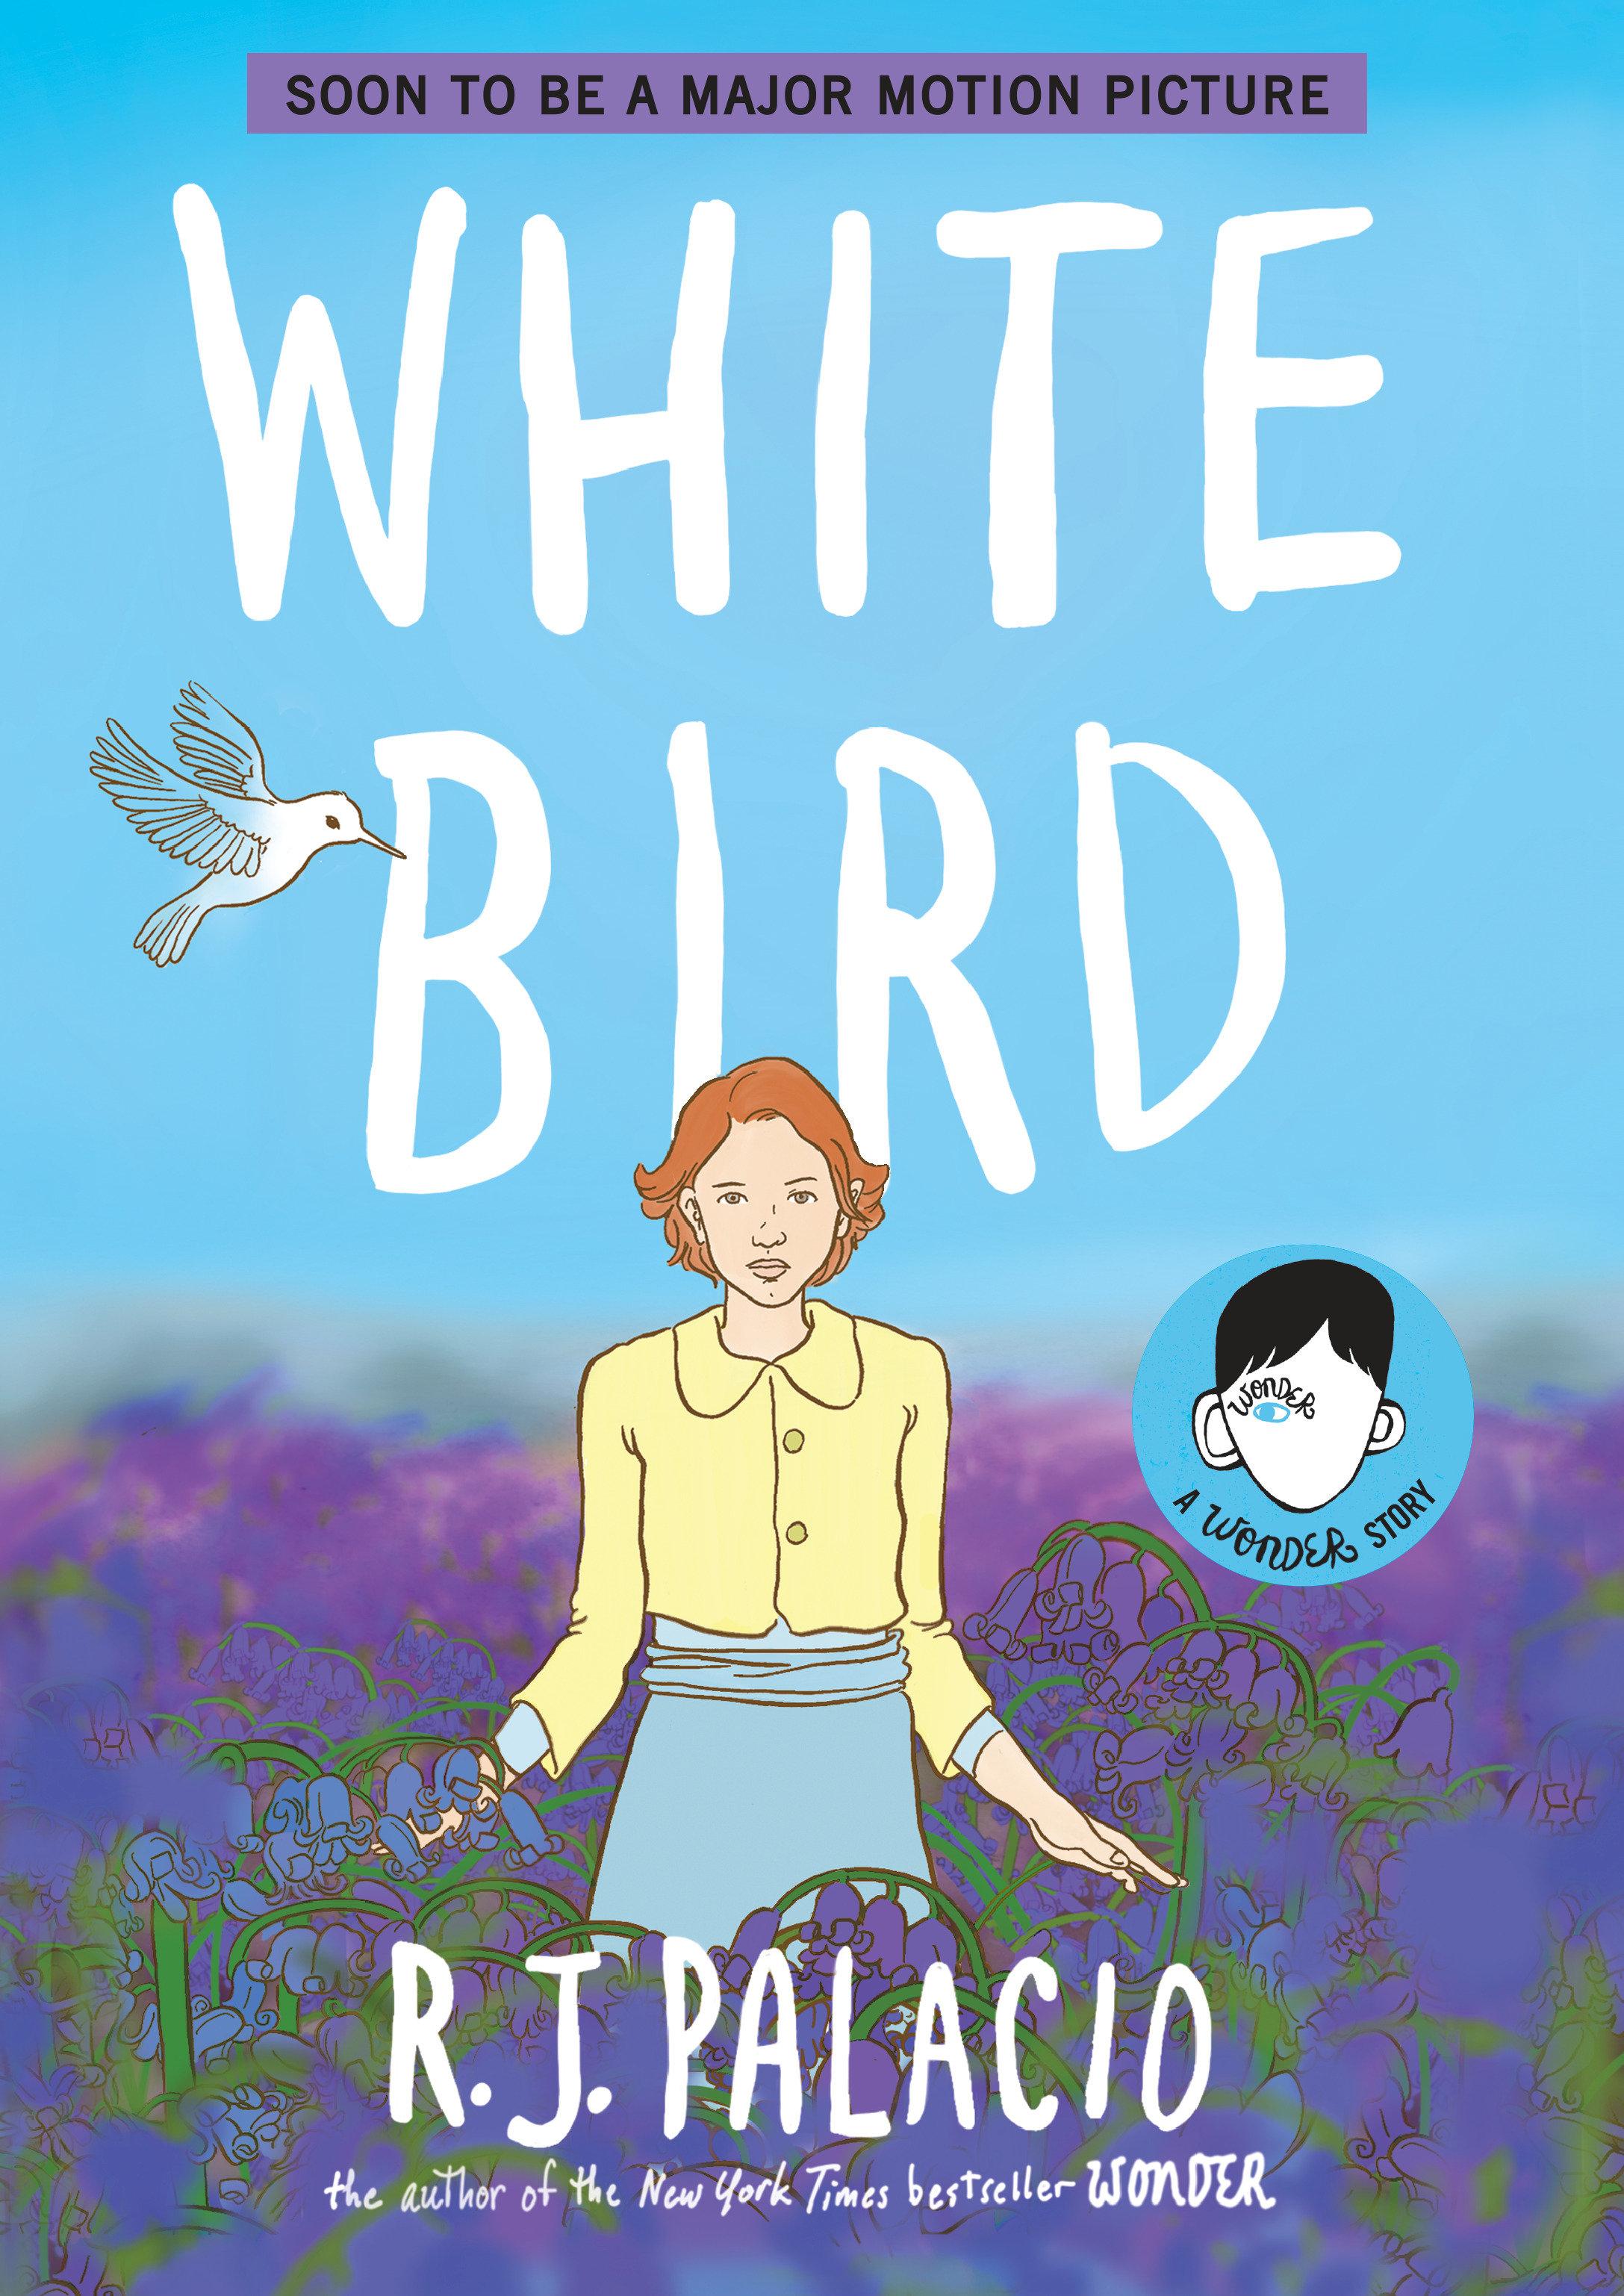 White bird cover image